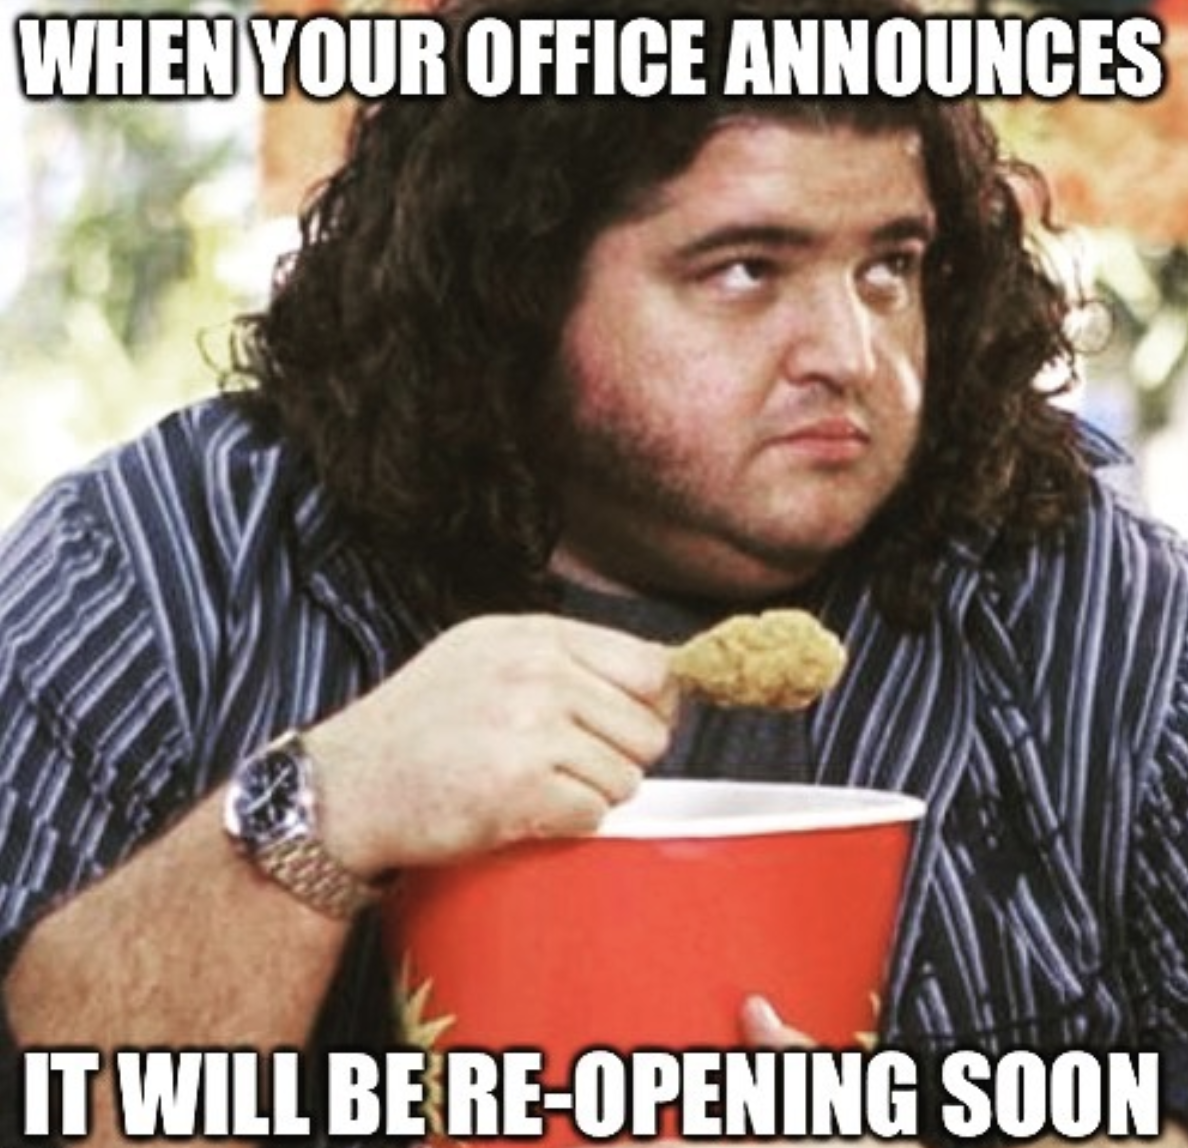 Office Reopening Meme